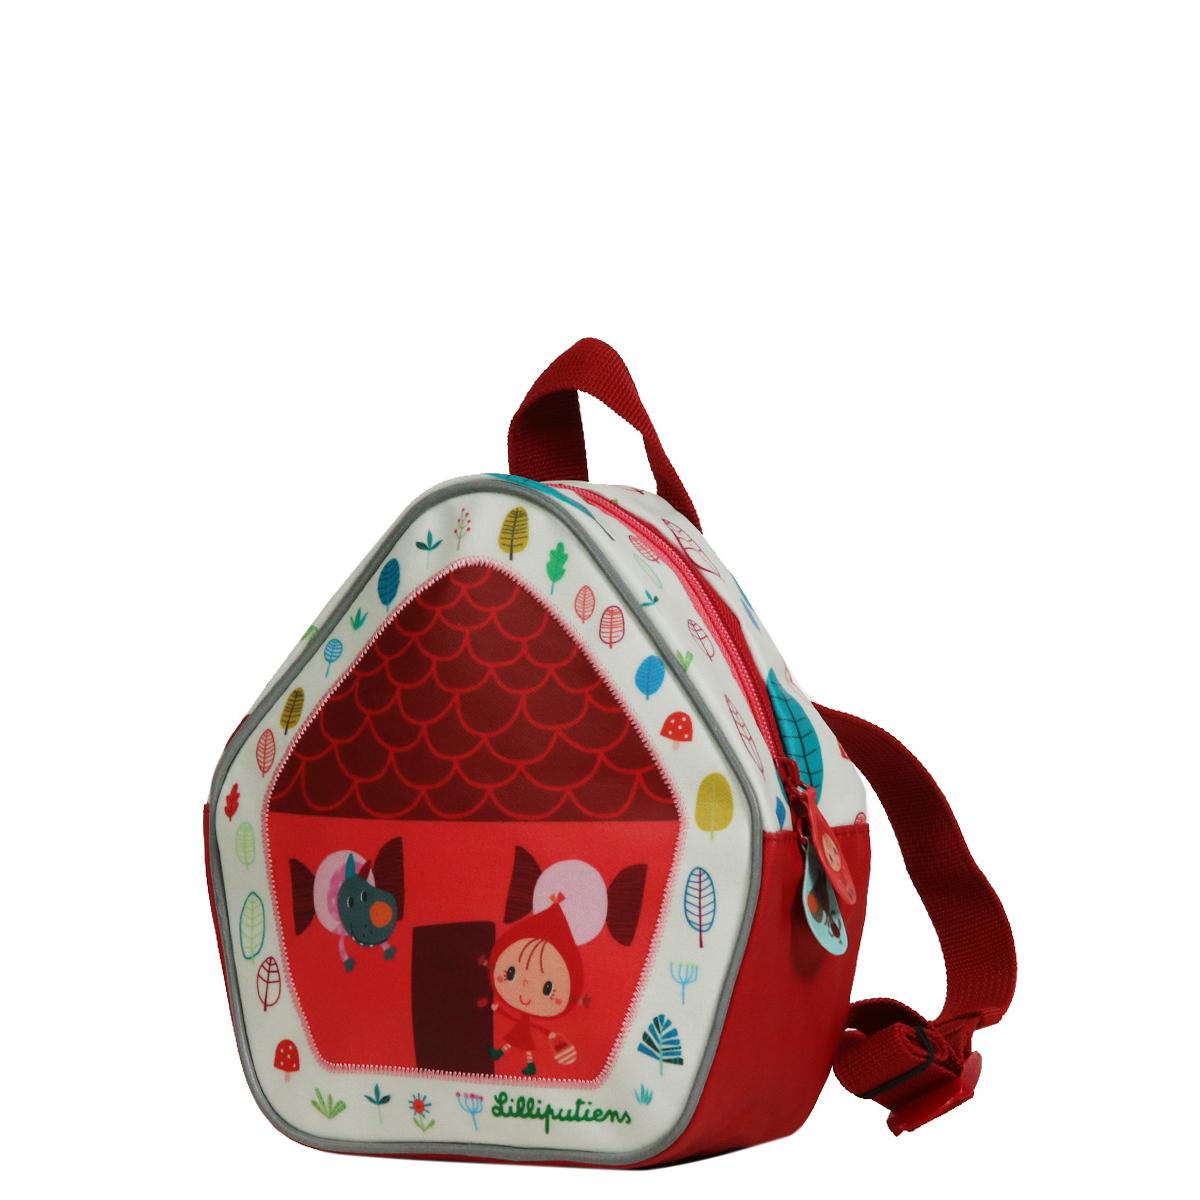 6f1a44bd17 Mini sac à dos Chaperon rouge - Sebio